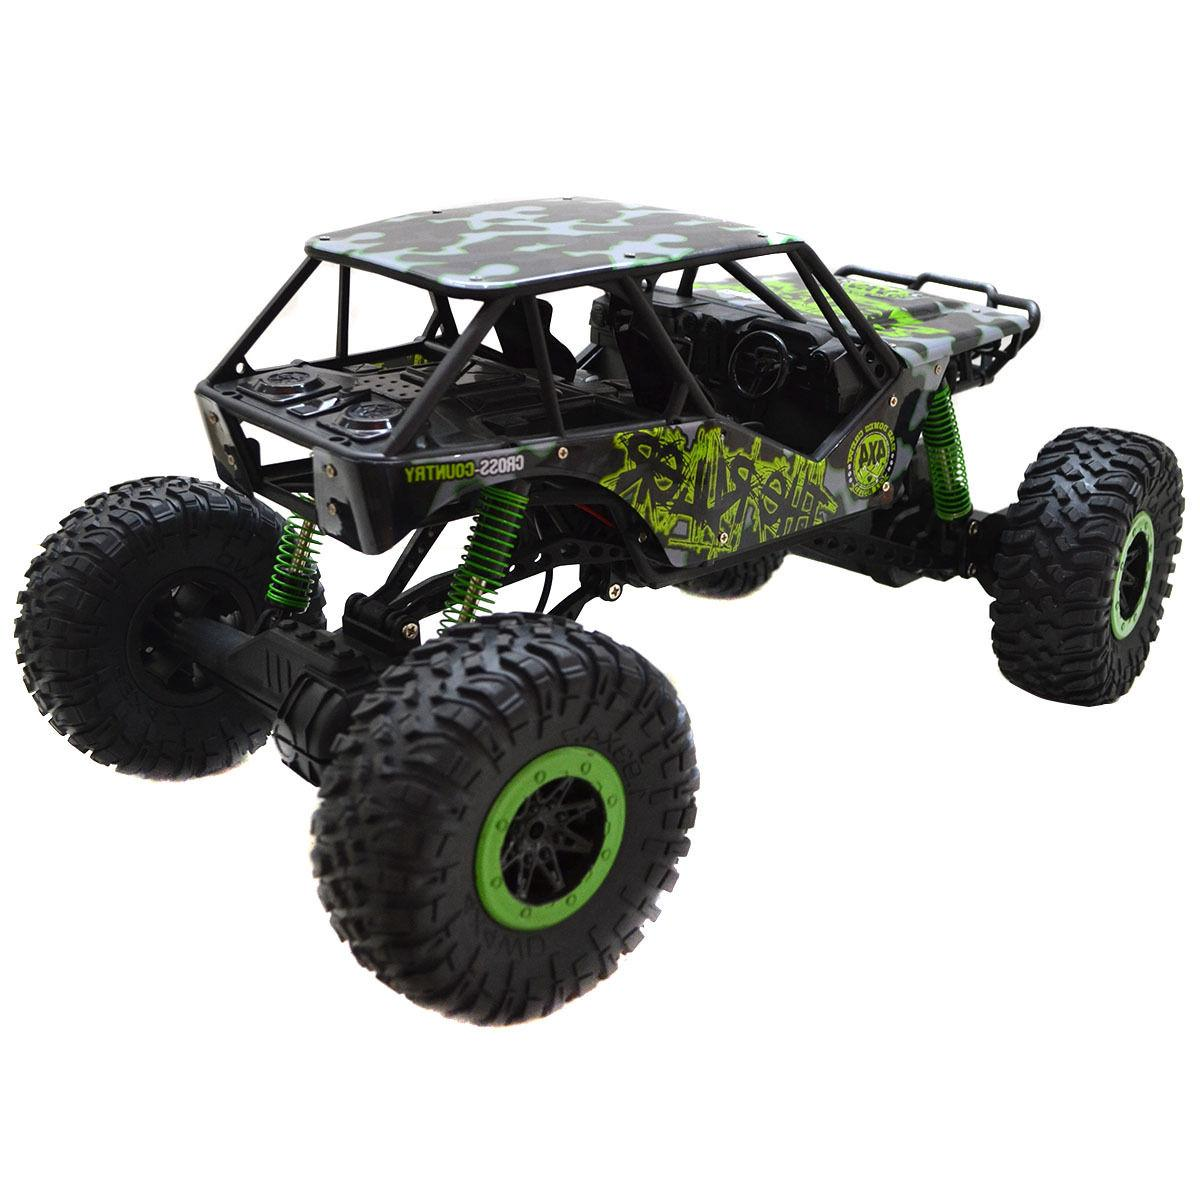 1:10 Rock 4 Wheel Remote Car Green